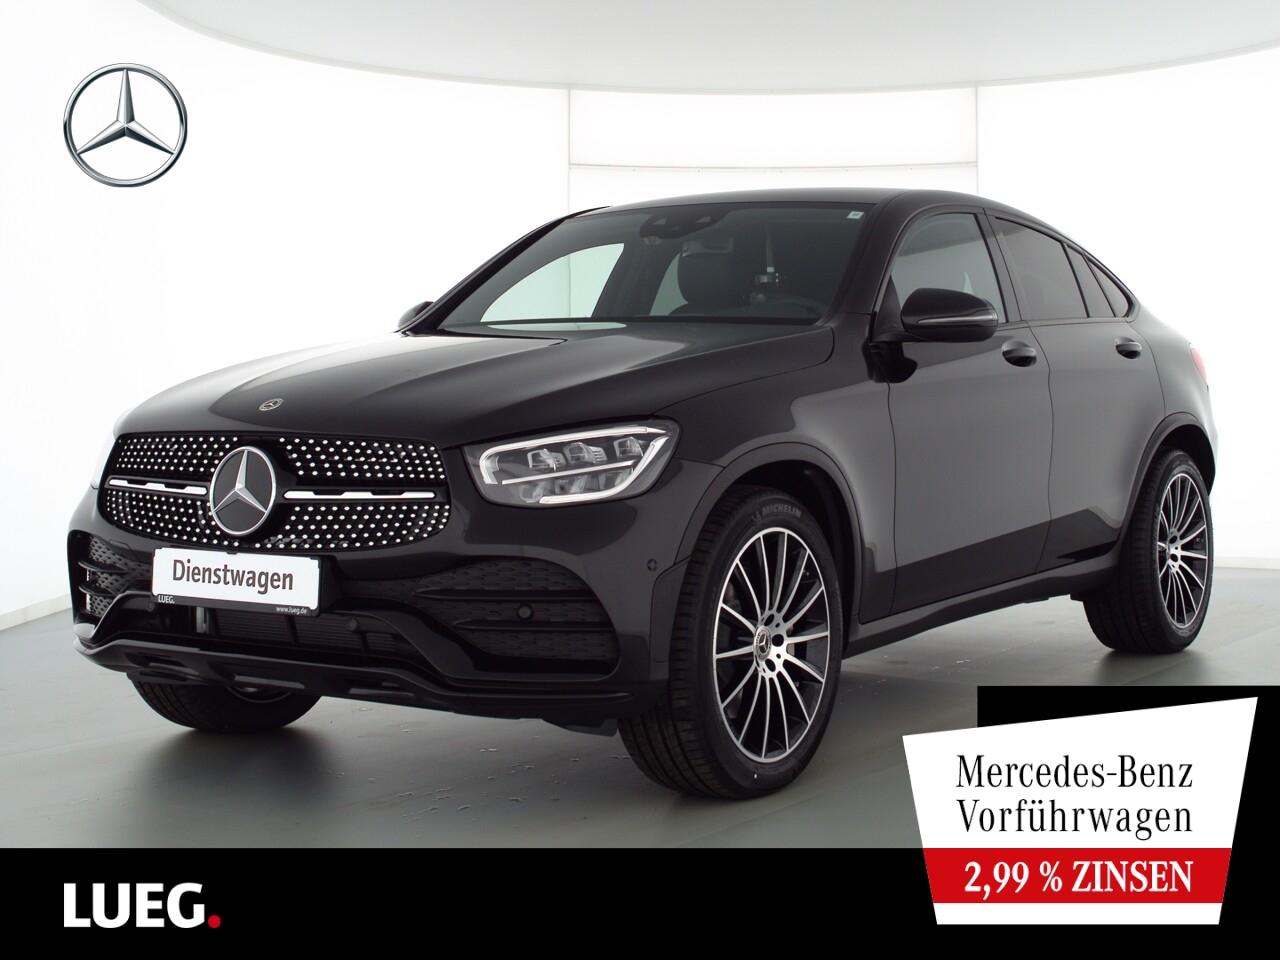 Mercedes-Benz GLC 220 d 4M Coupé AMG+NIGHT+20''+AHK+TOTW+SOUN, Jahr 2021, Diesel